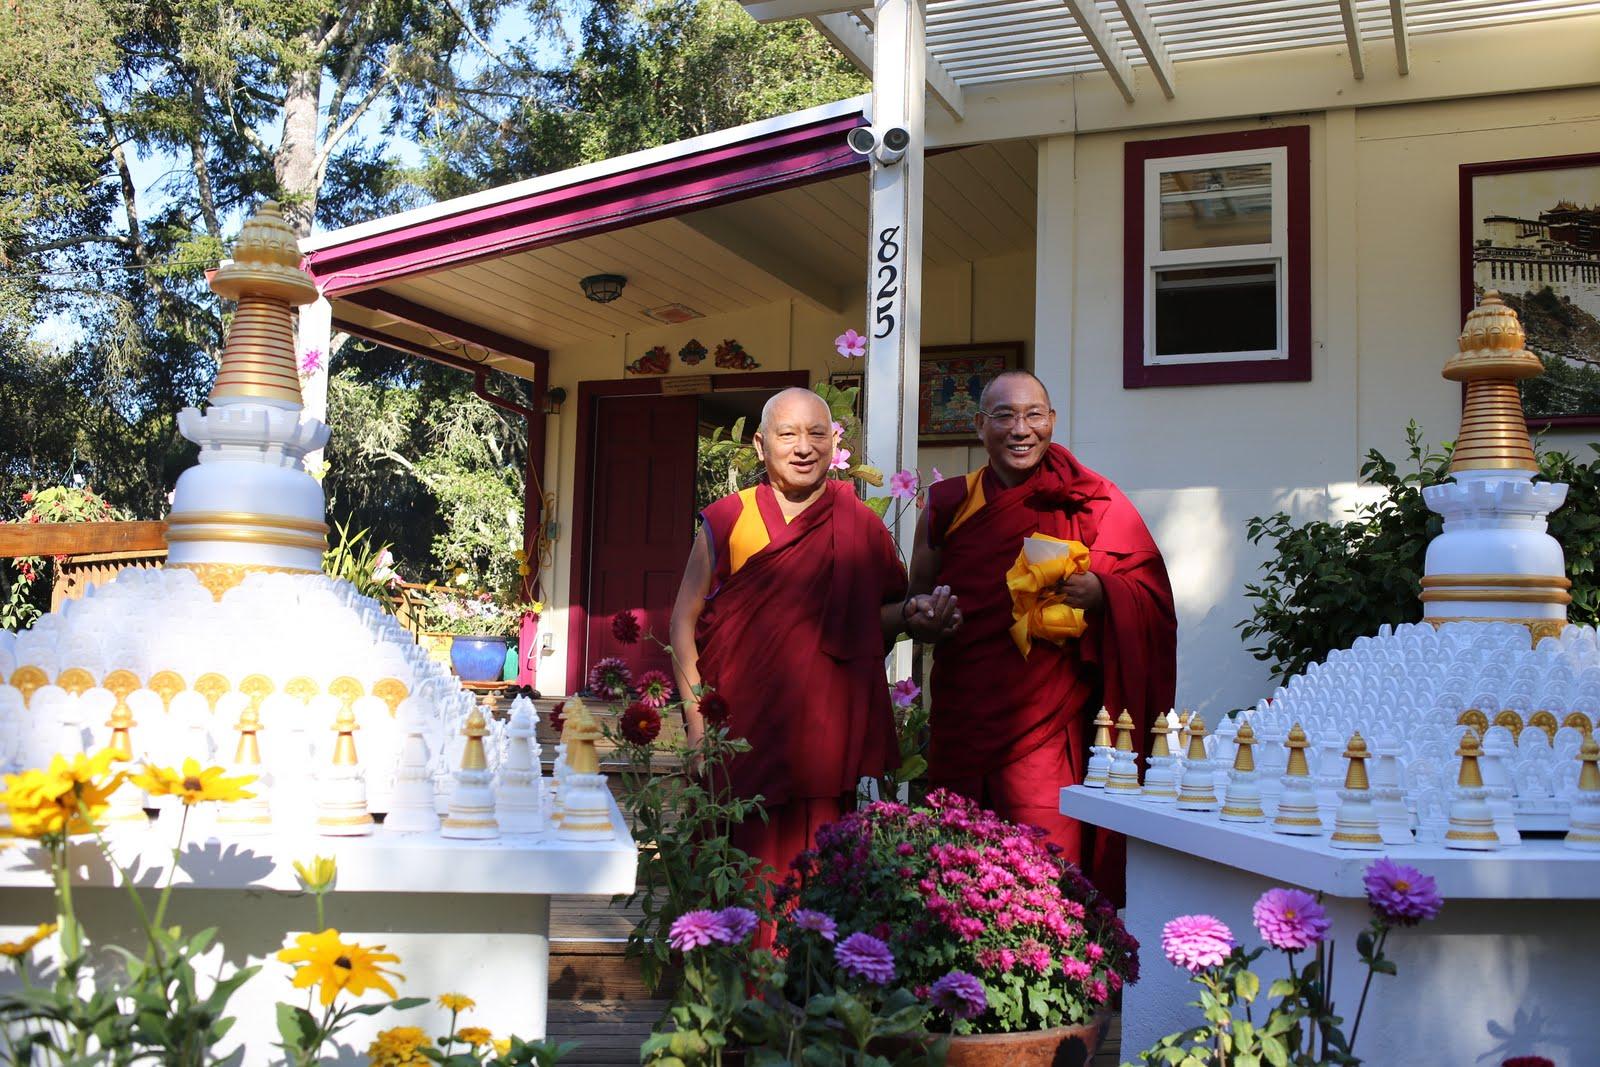 Dagri Rinpoche visiting Lama Zopa Rinpoche at his home in California. October 2013. Ven. Thubten Kunsang.